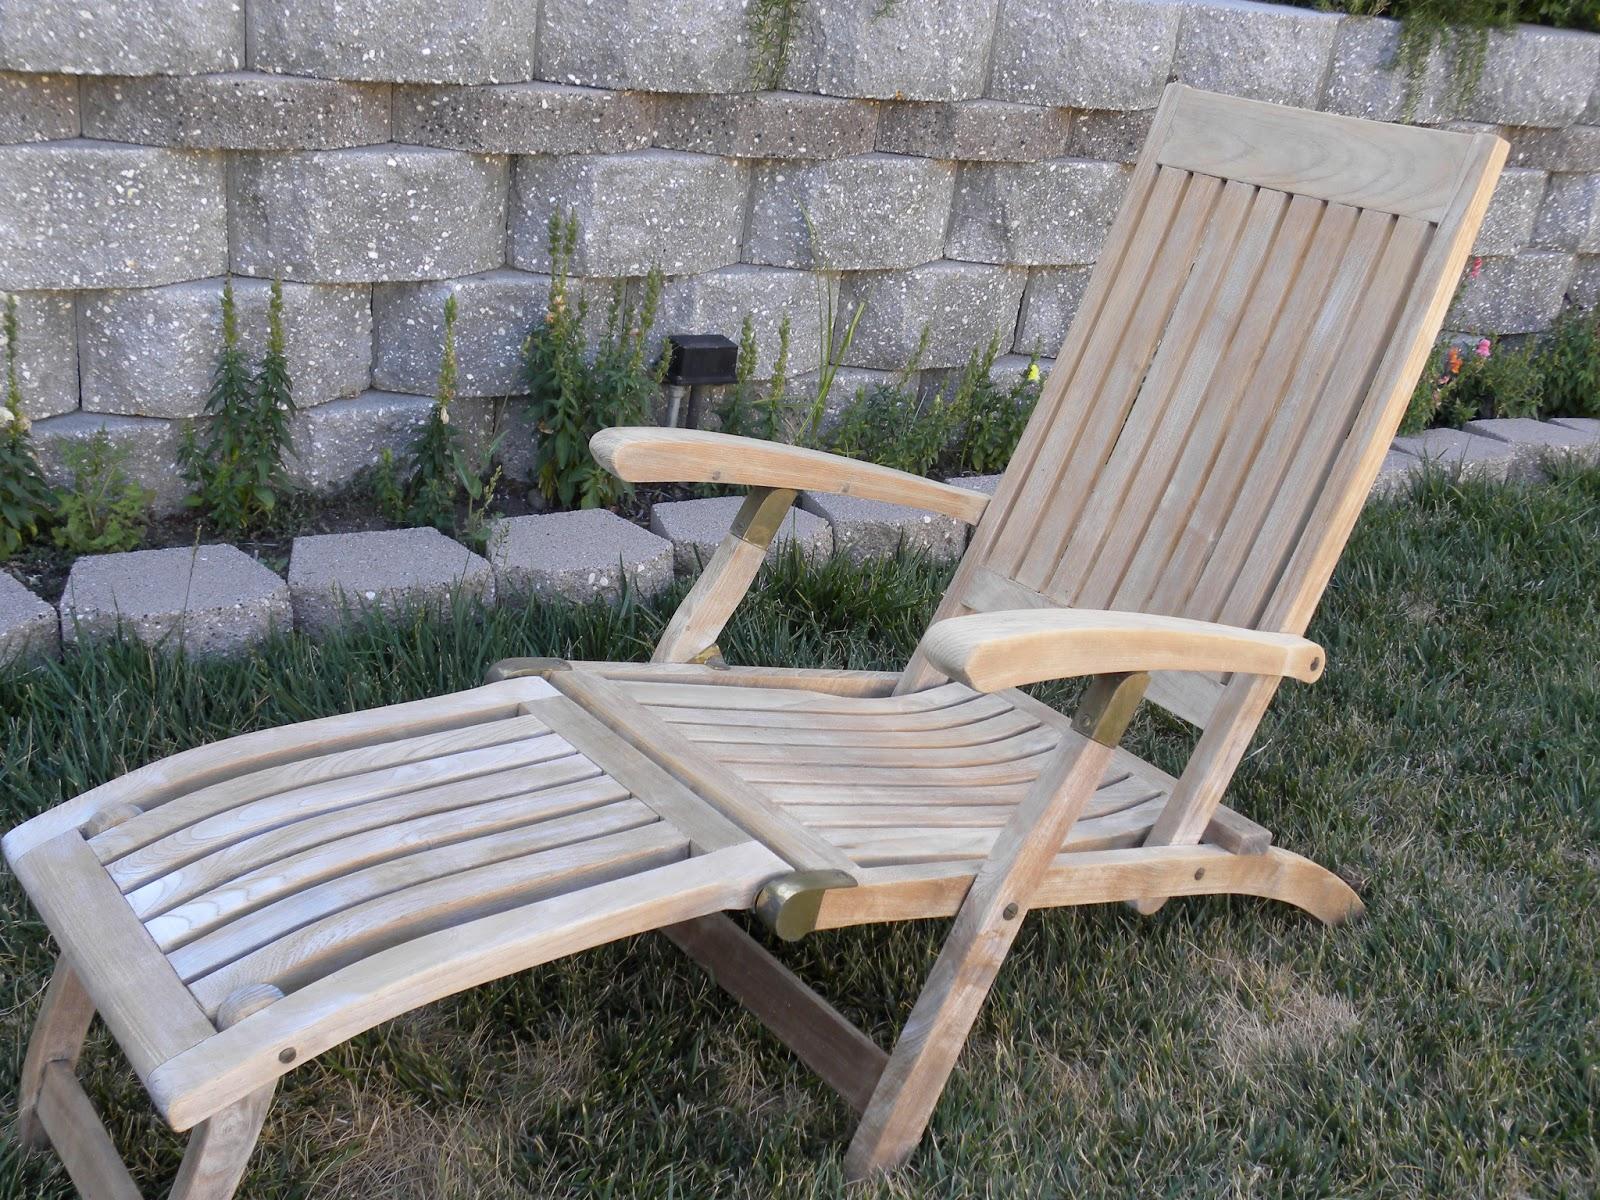 HanieBCreations: DIY: Restore Old Teak Wood Outdoor Furniture